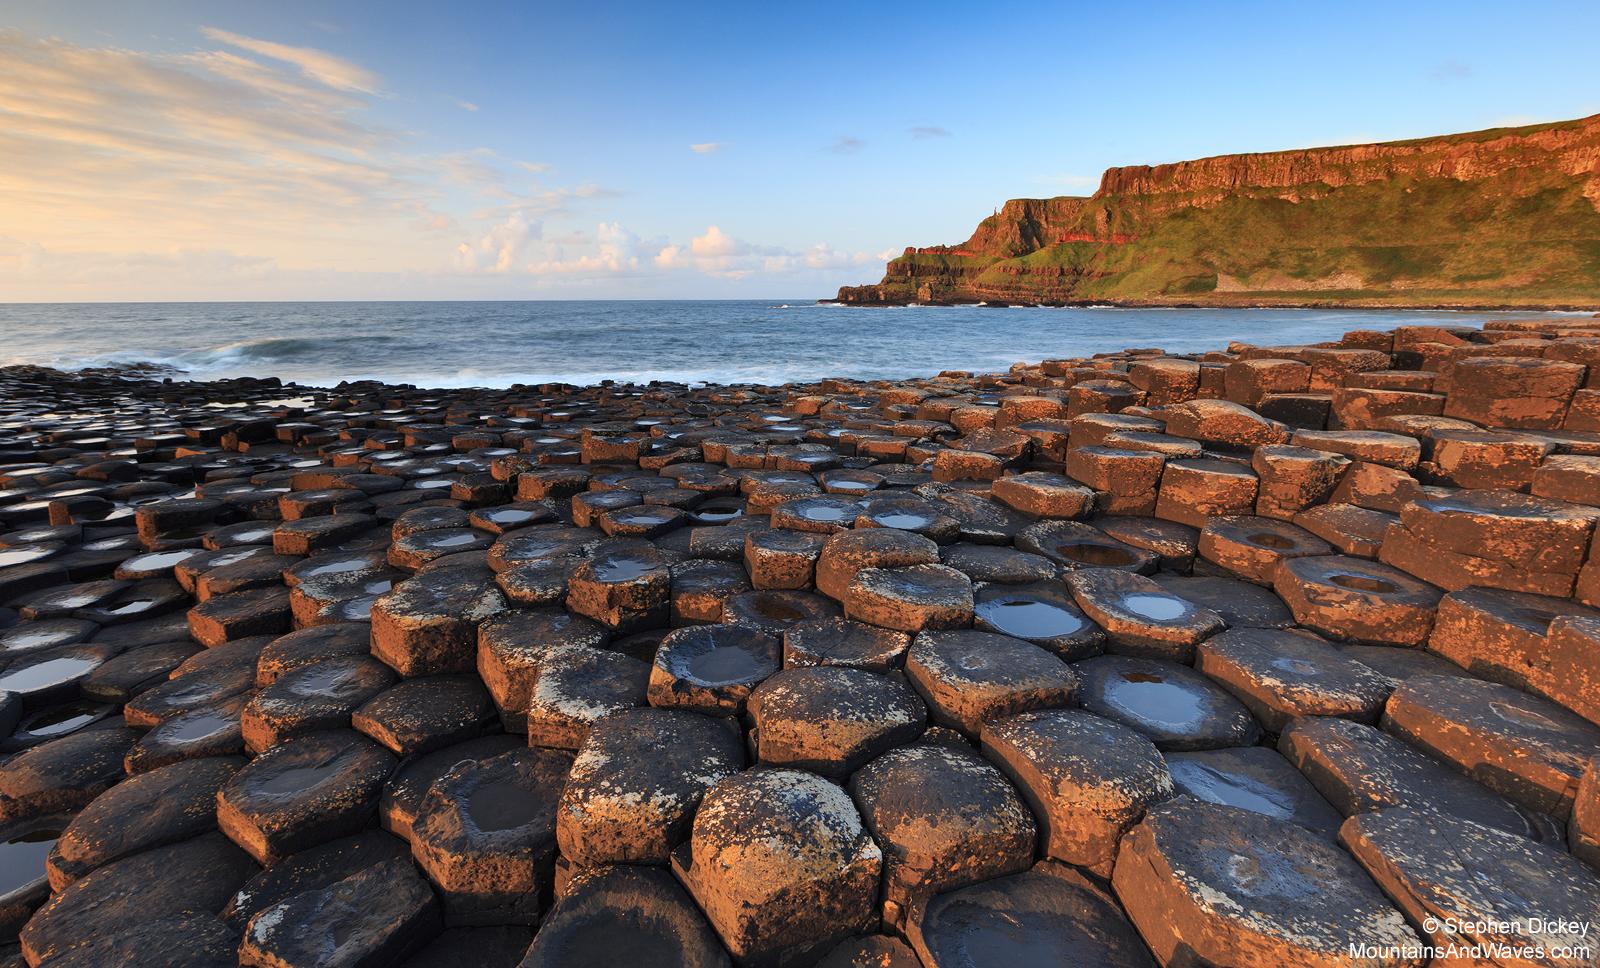 The Giant's Causeway, County Antrim, Northern Ireland